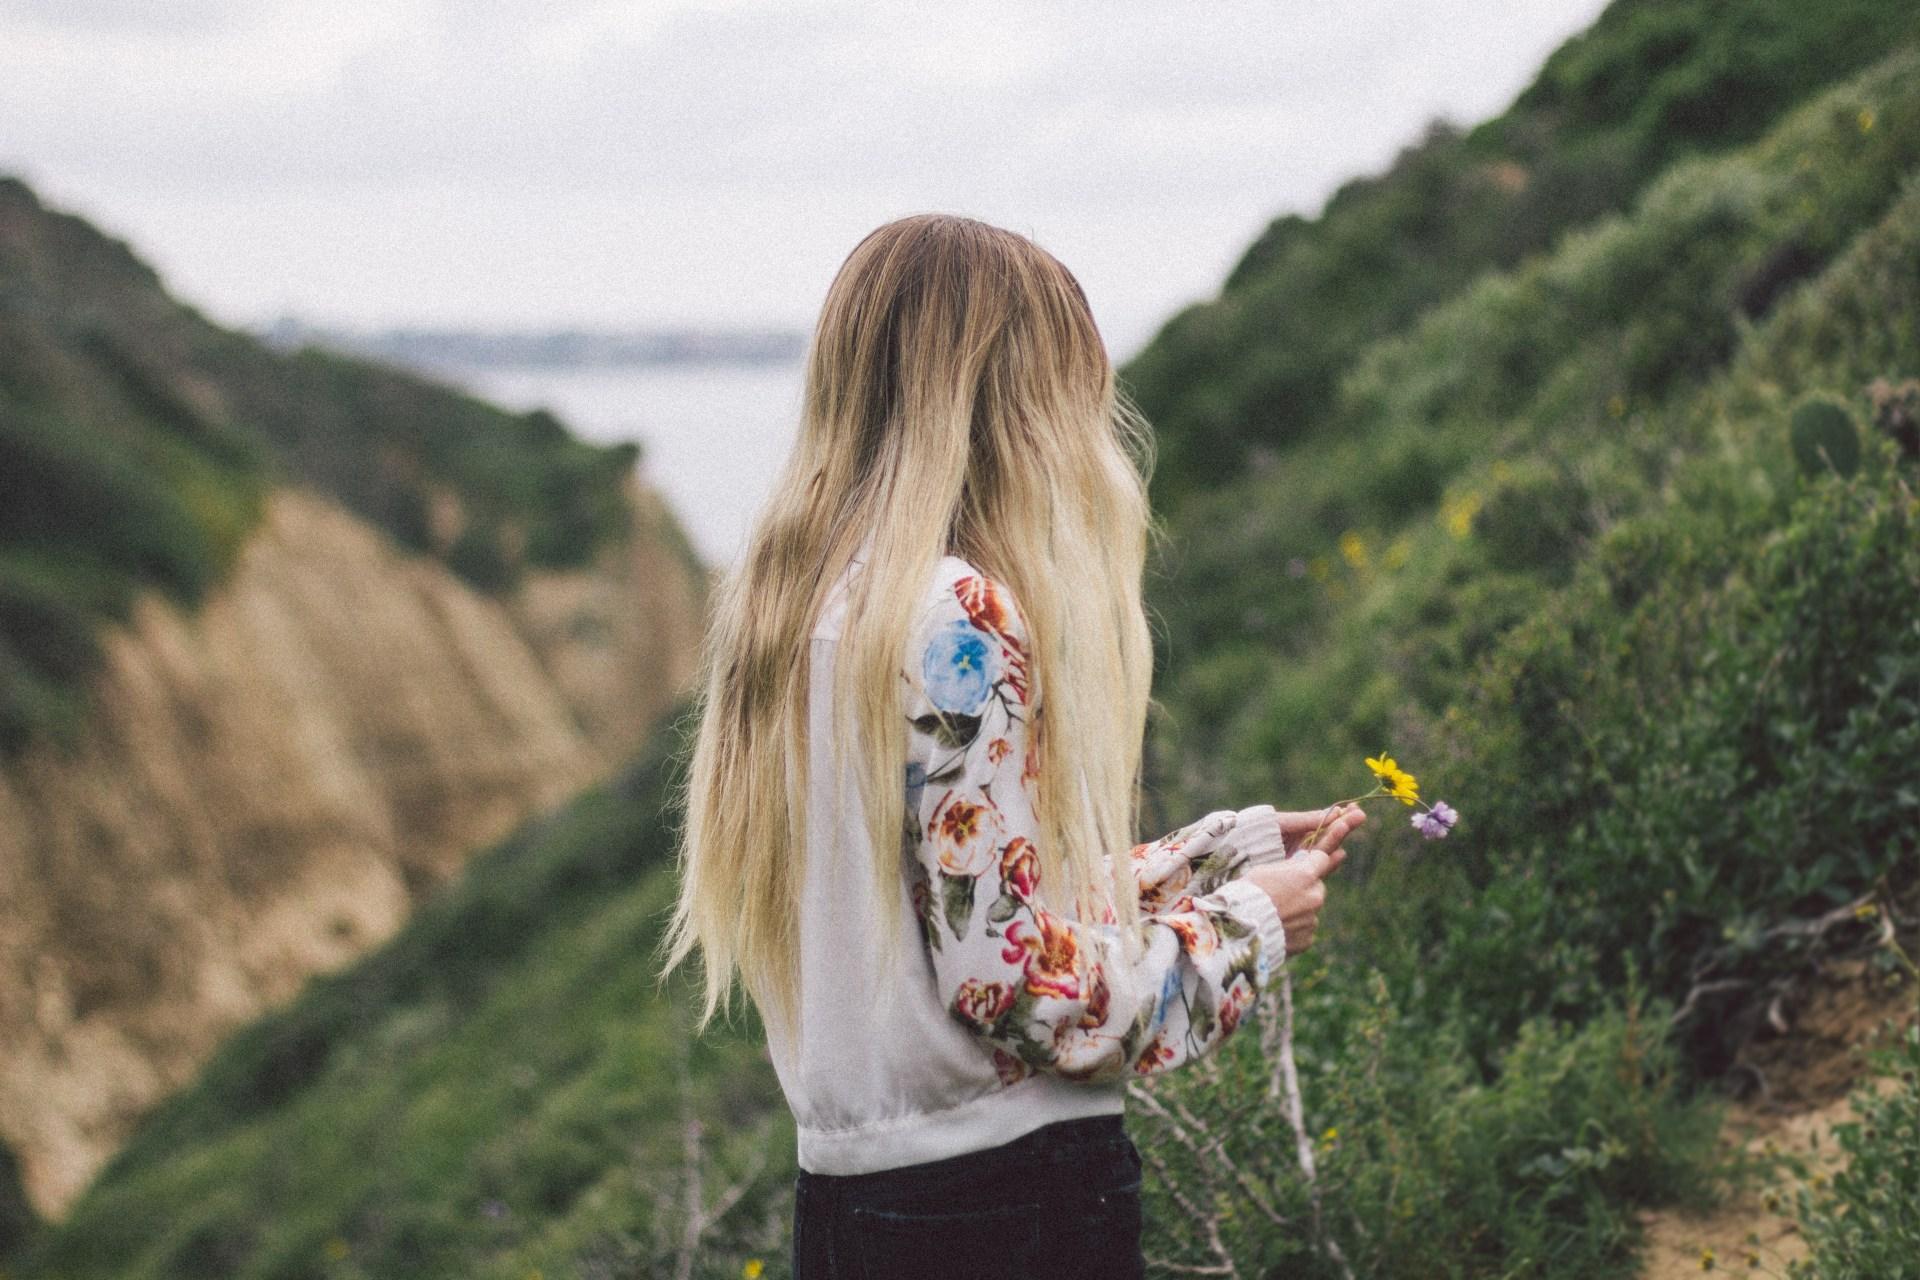 My First Healing Step Post-Breakup